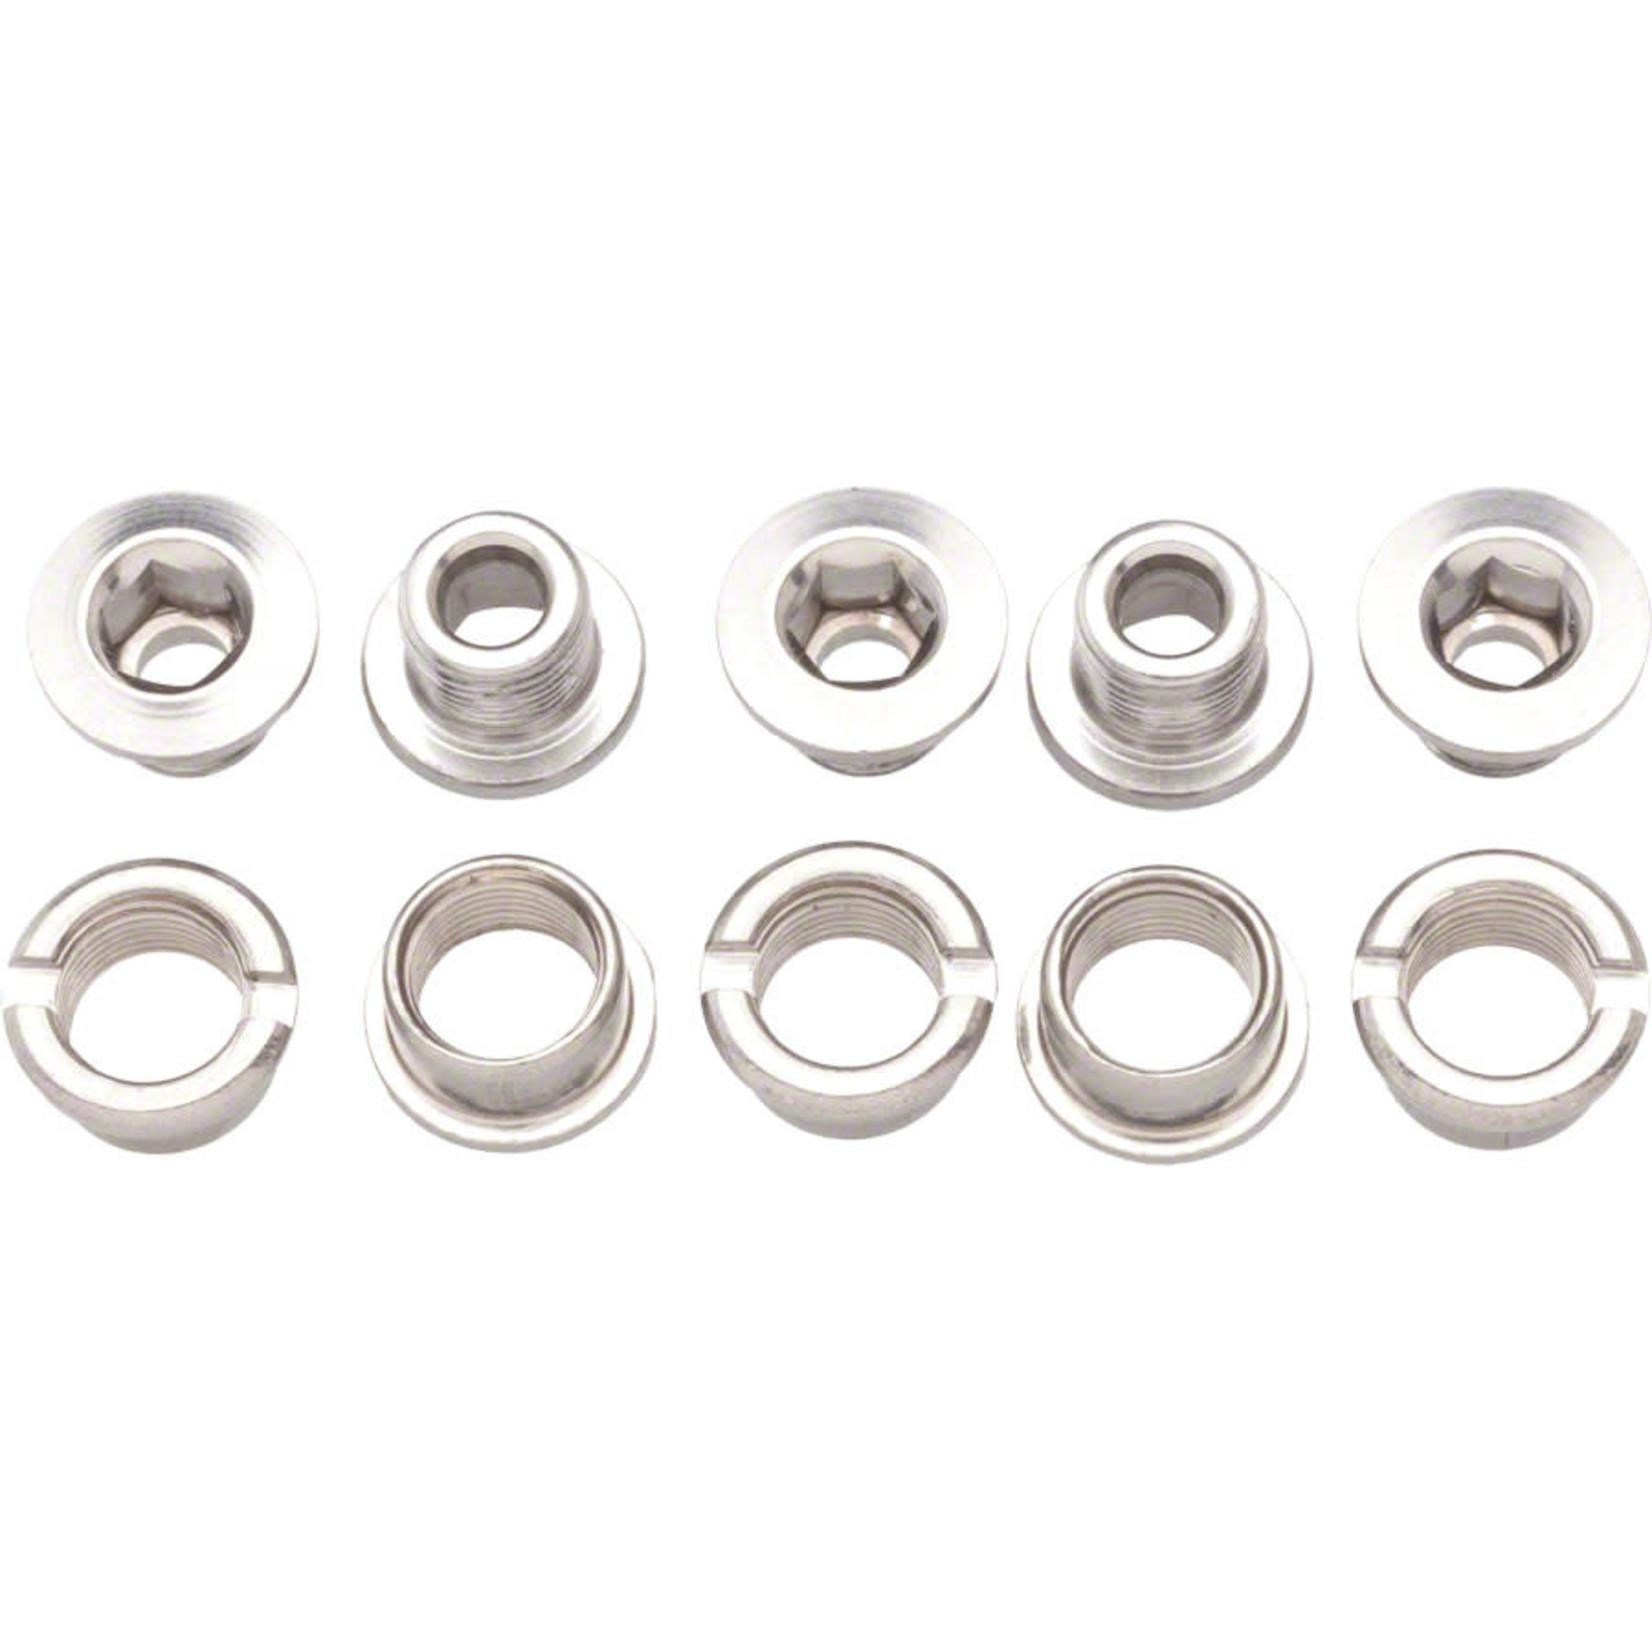 Problem Solvers Problem Solvers Double Chainring Bolt/Nut Set Alloy Silver Set of 5